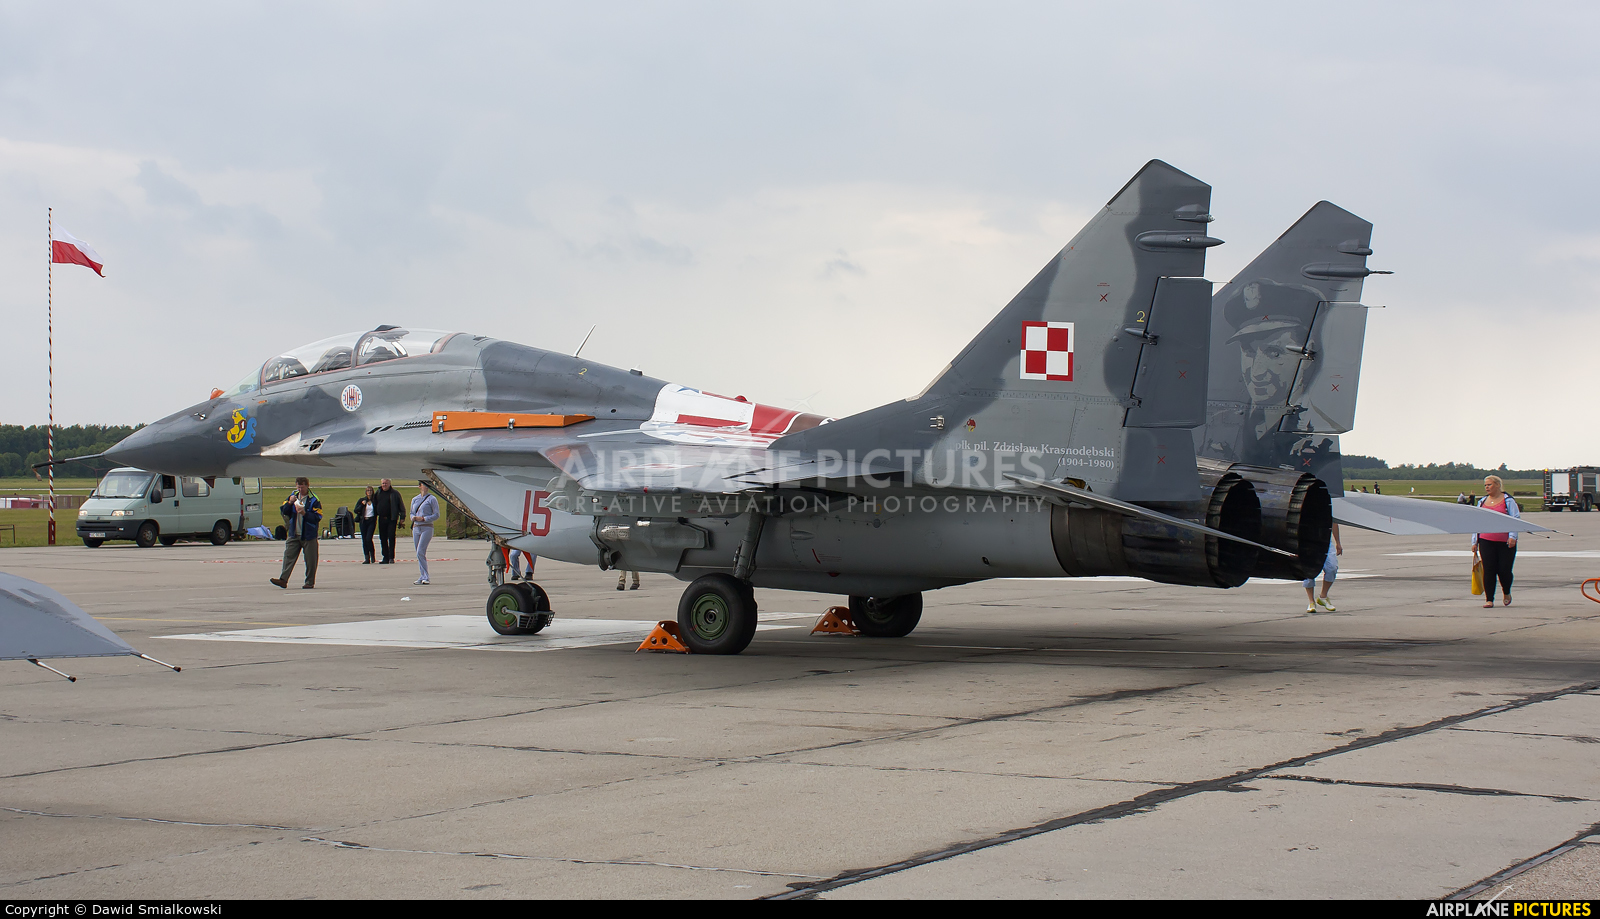 Poland - Air Force 15 aircraft at Świdwin